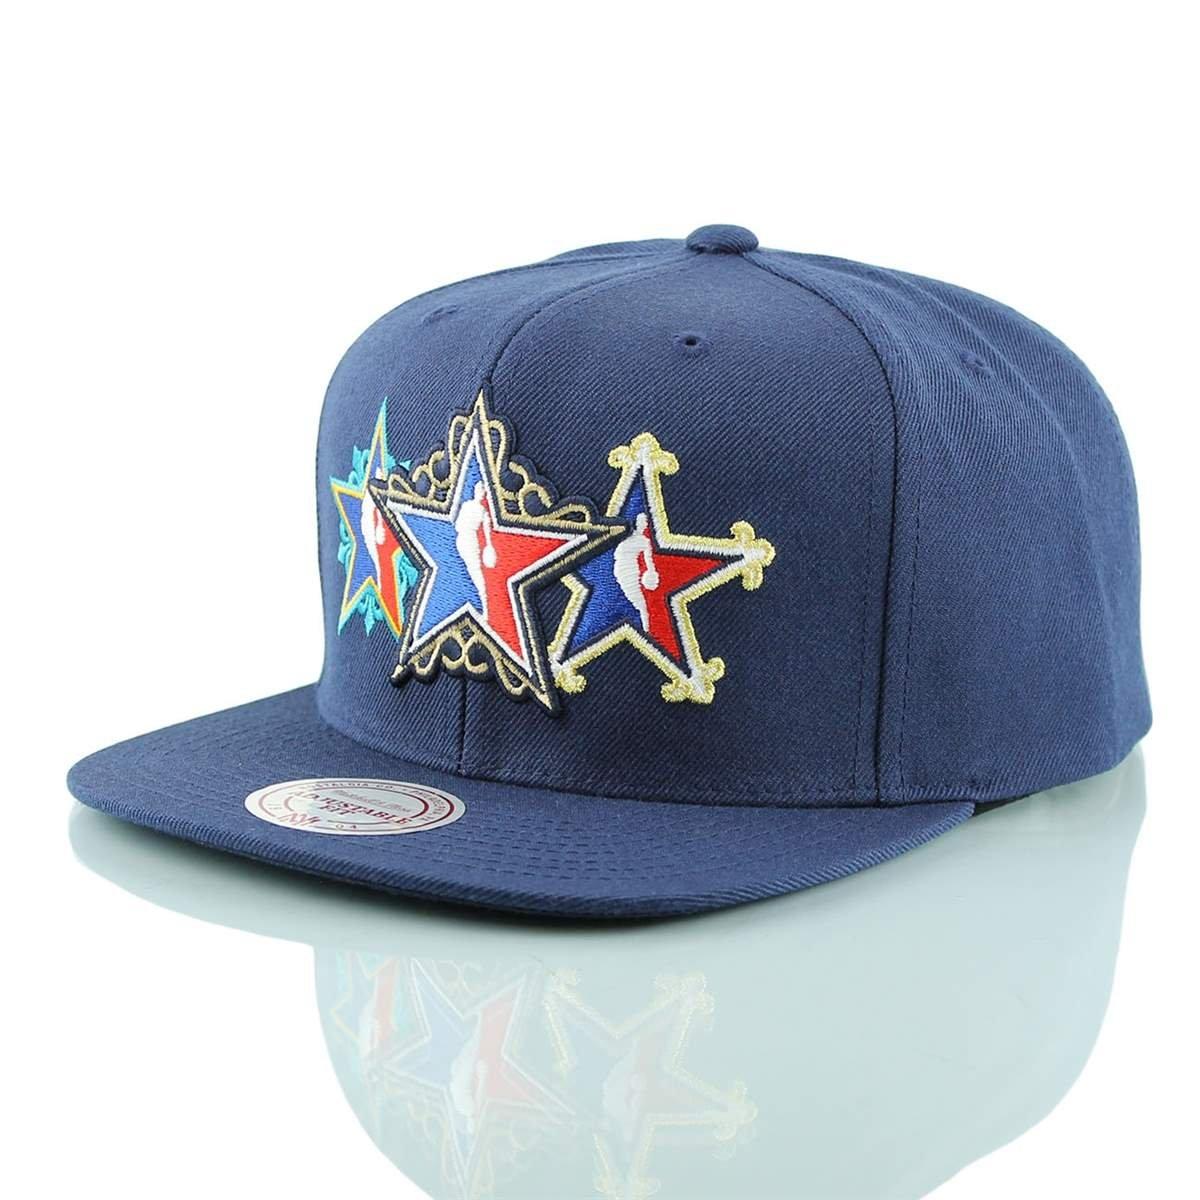 Mitchell   Ness 2017 NBA All-Star Game Historic Stars Snapback Cap Navy   Amazon.co.uk  Sports   Outdoors be3f428e667e